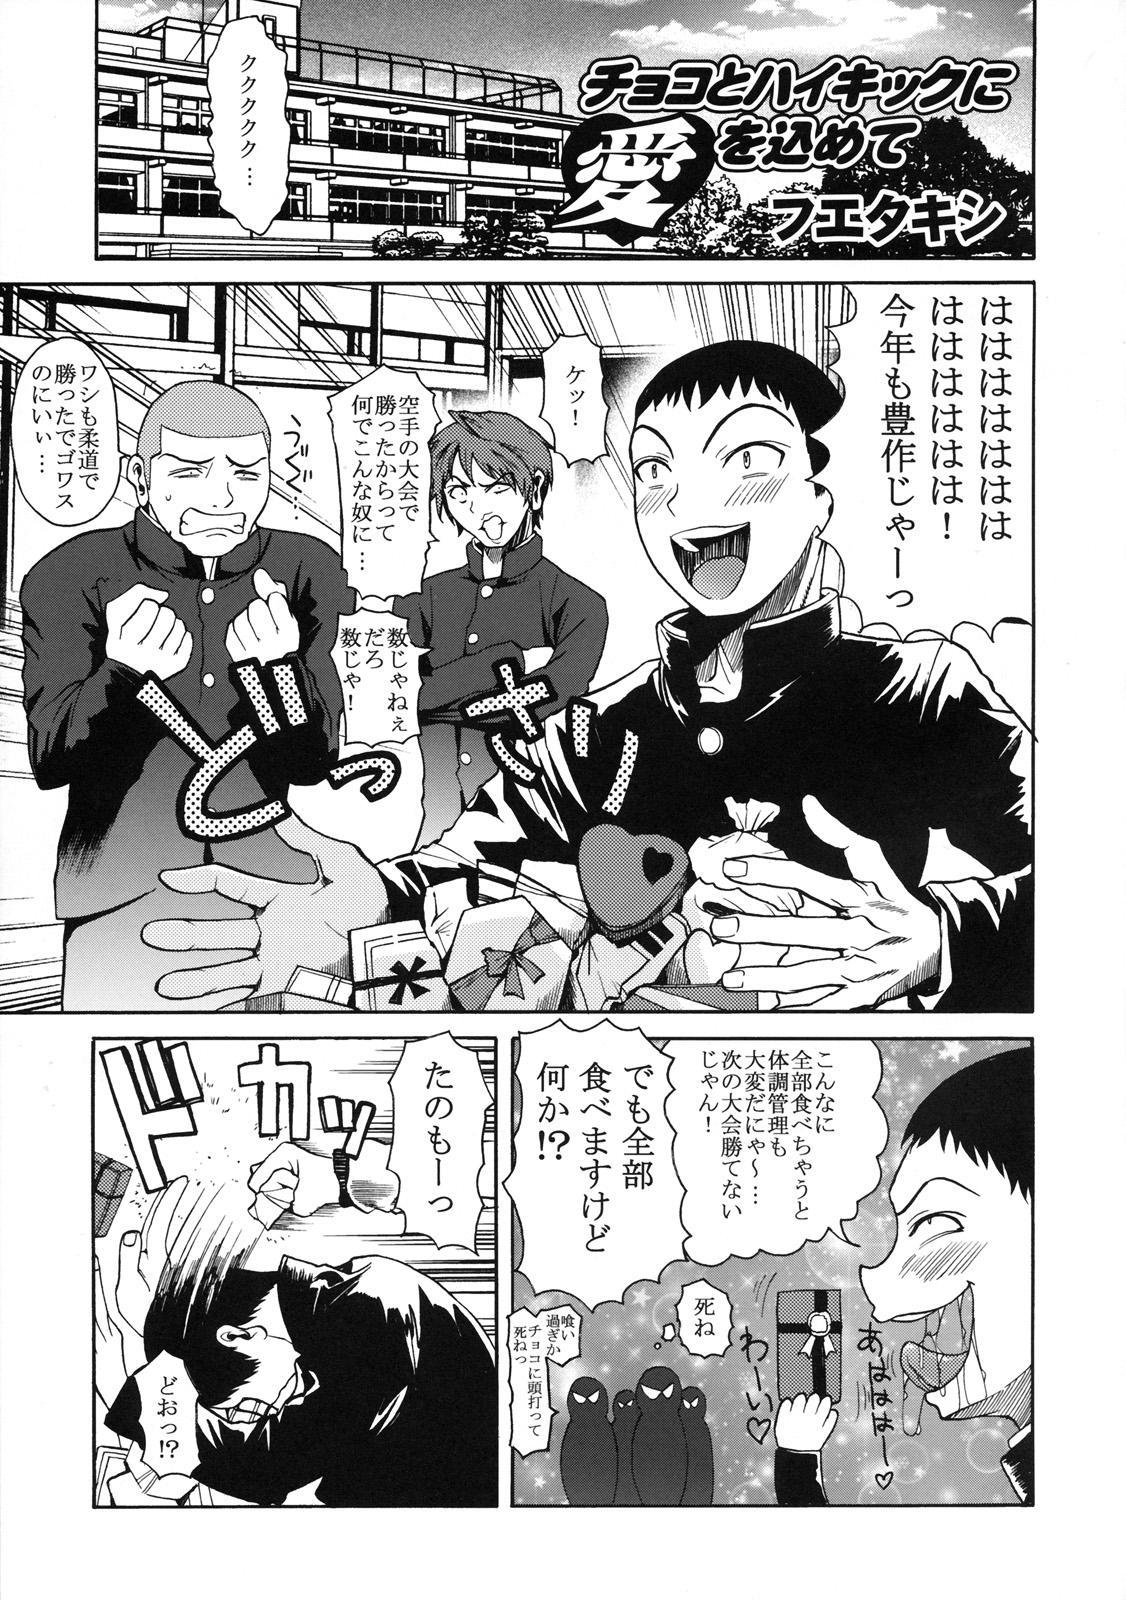 Shinzui Valentine Special Vol. 1 3